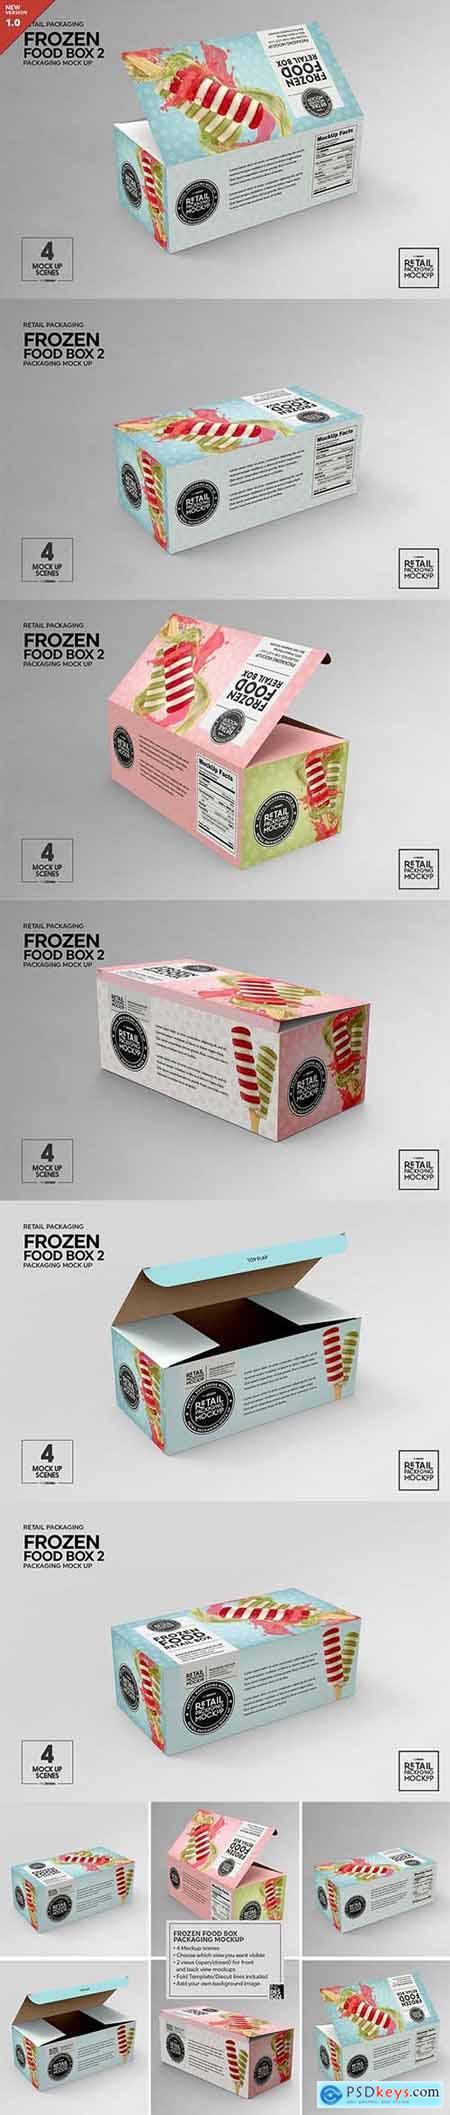 Creativemarket Retail Frozen Food Packaging2 Mockup 5730740